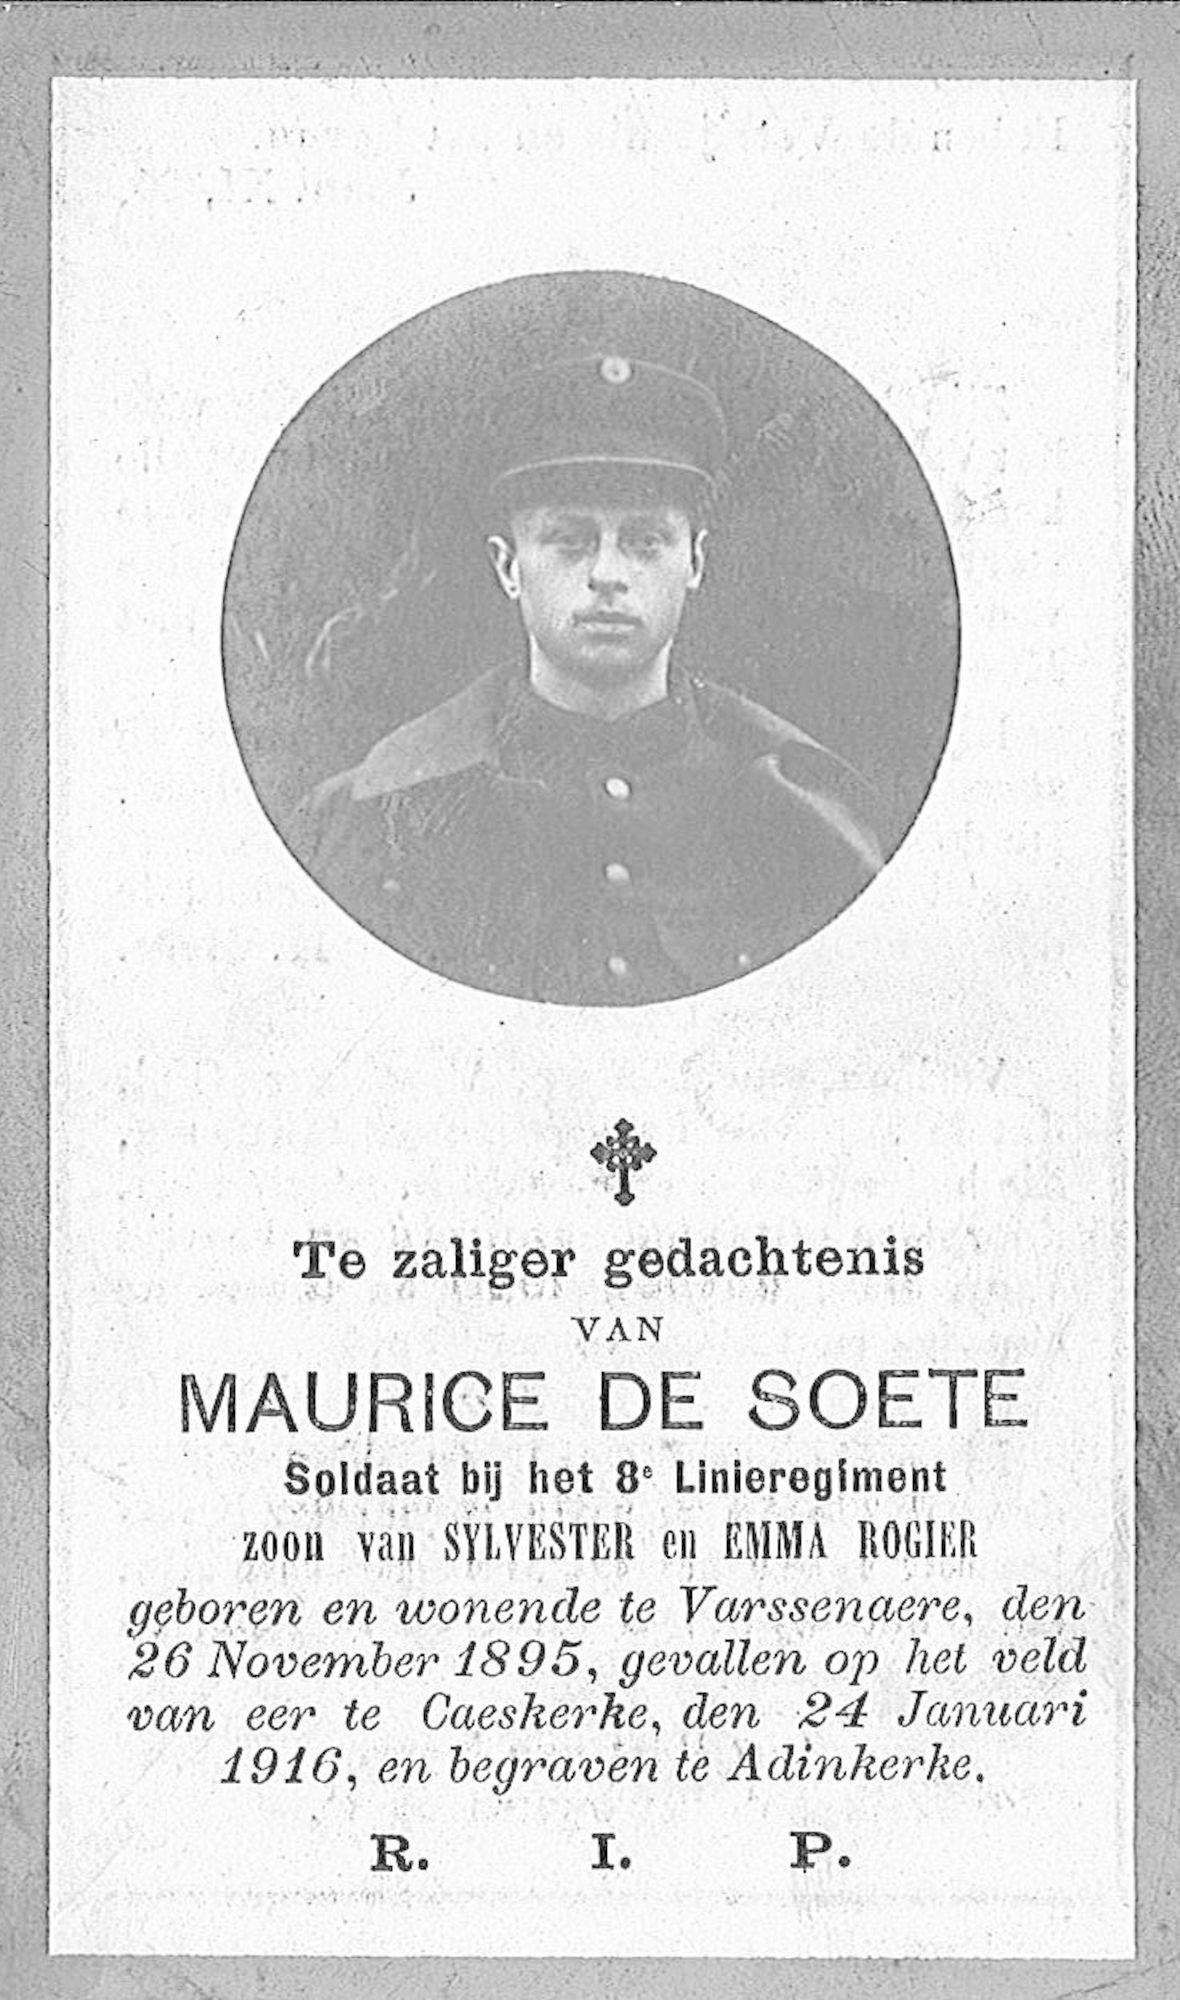 Maurice De Soete